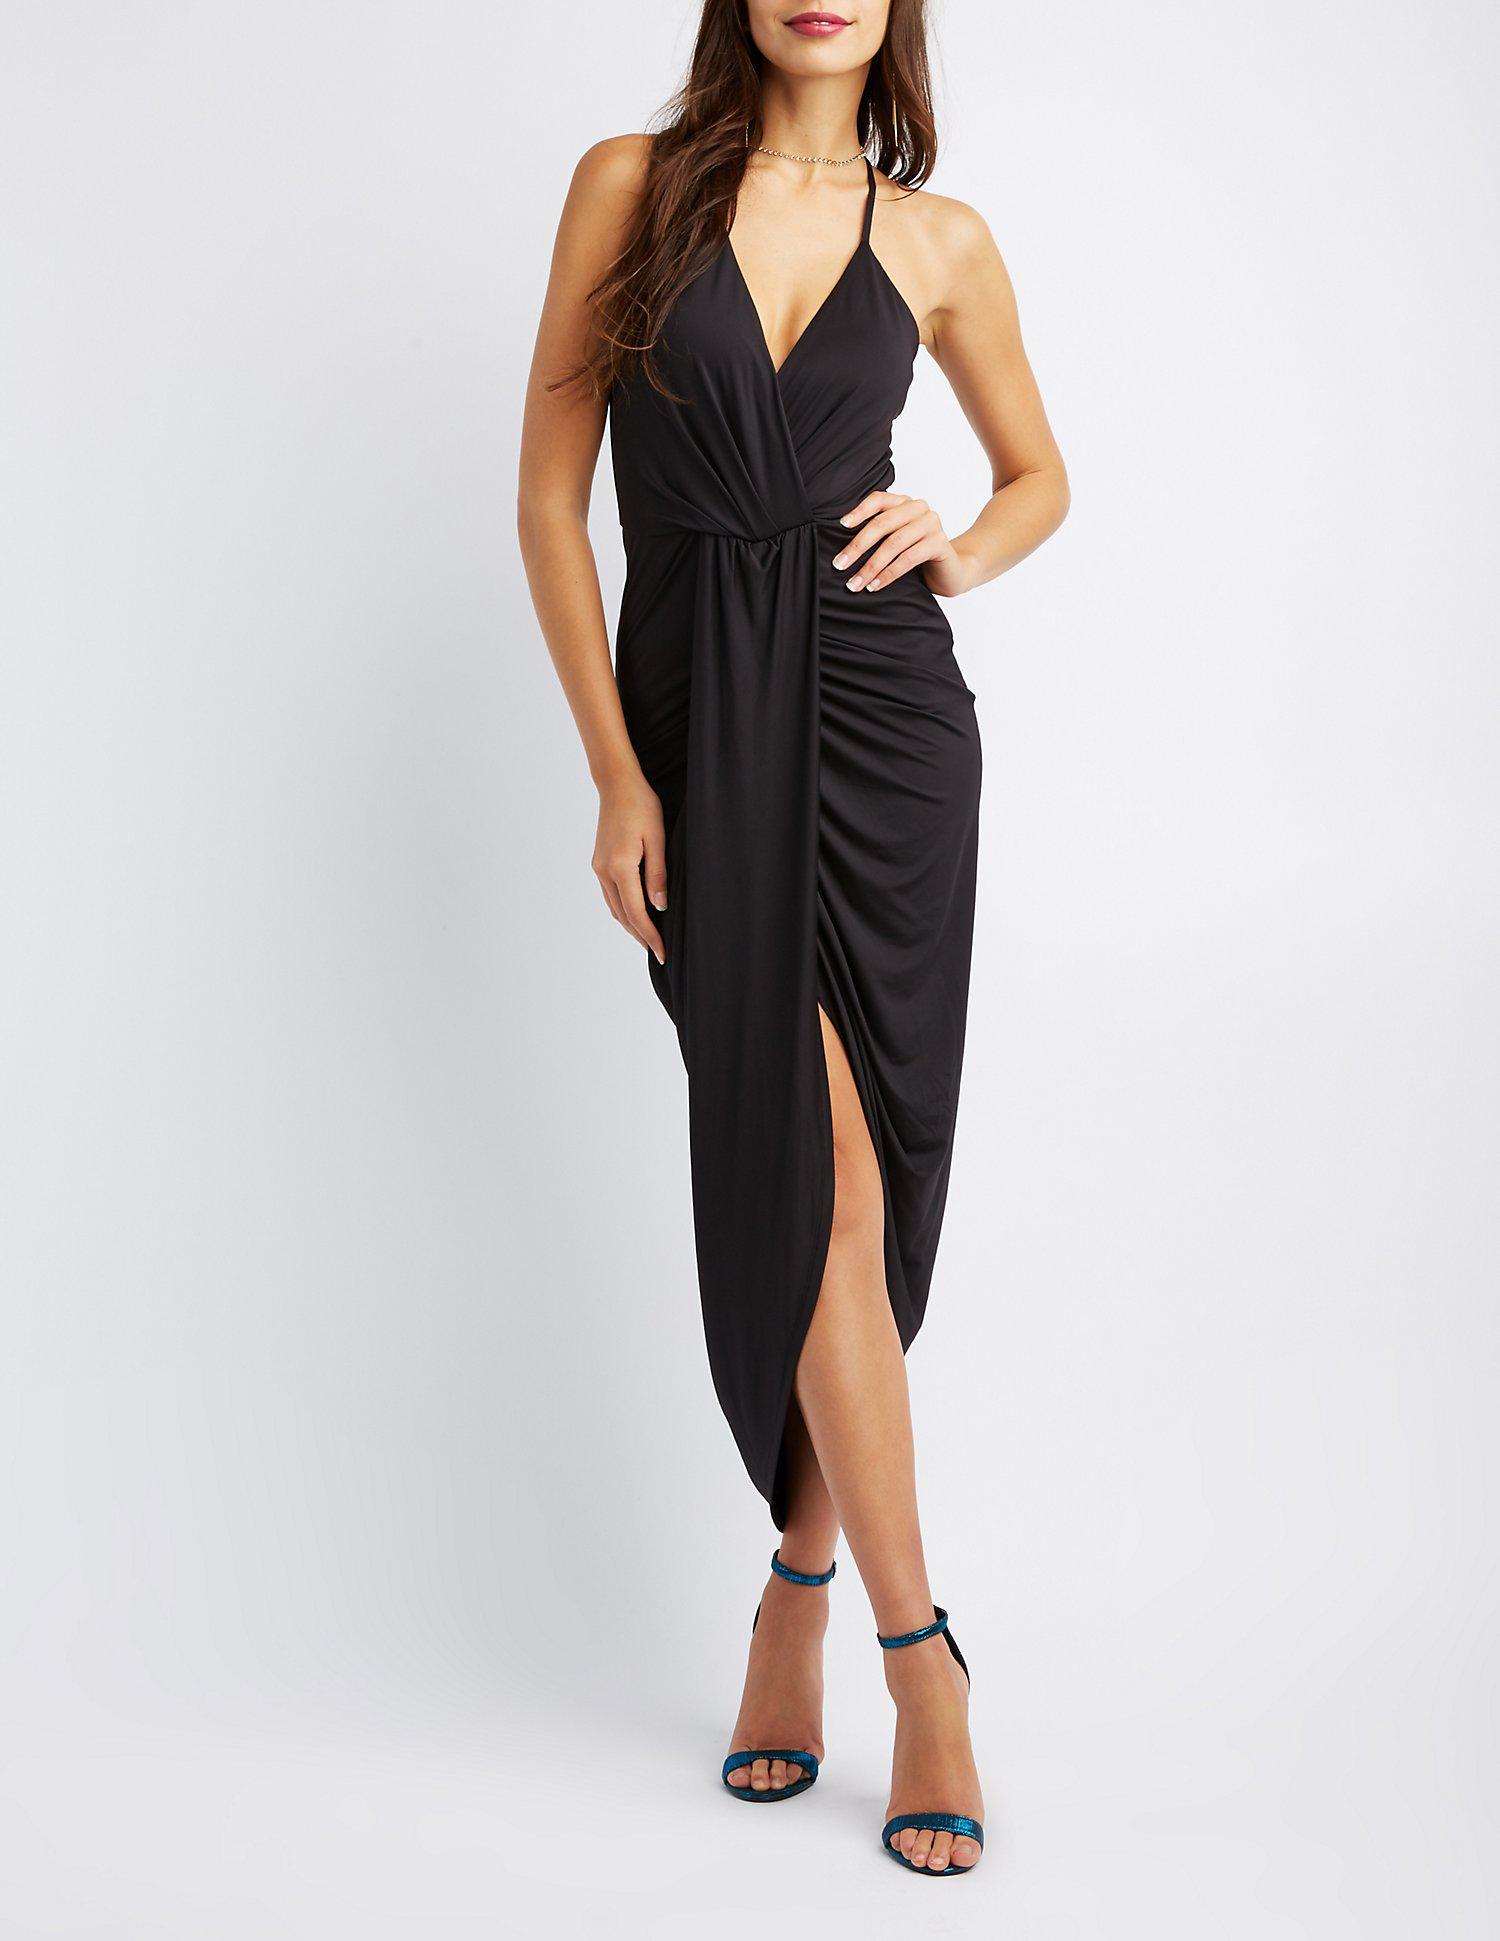 8cc44e4b0a3 Lyst - Charlotte Russe Surplice Tulip Maxi Dress in Black